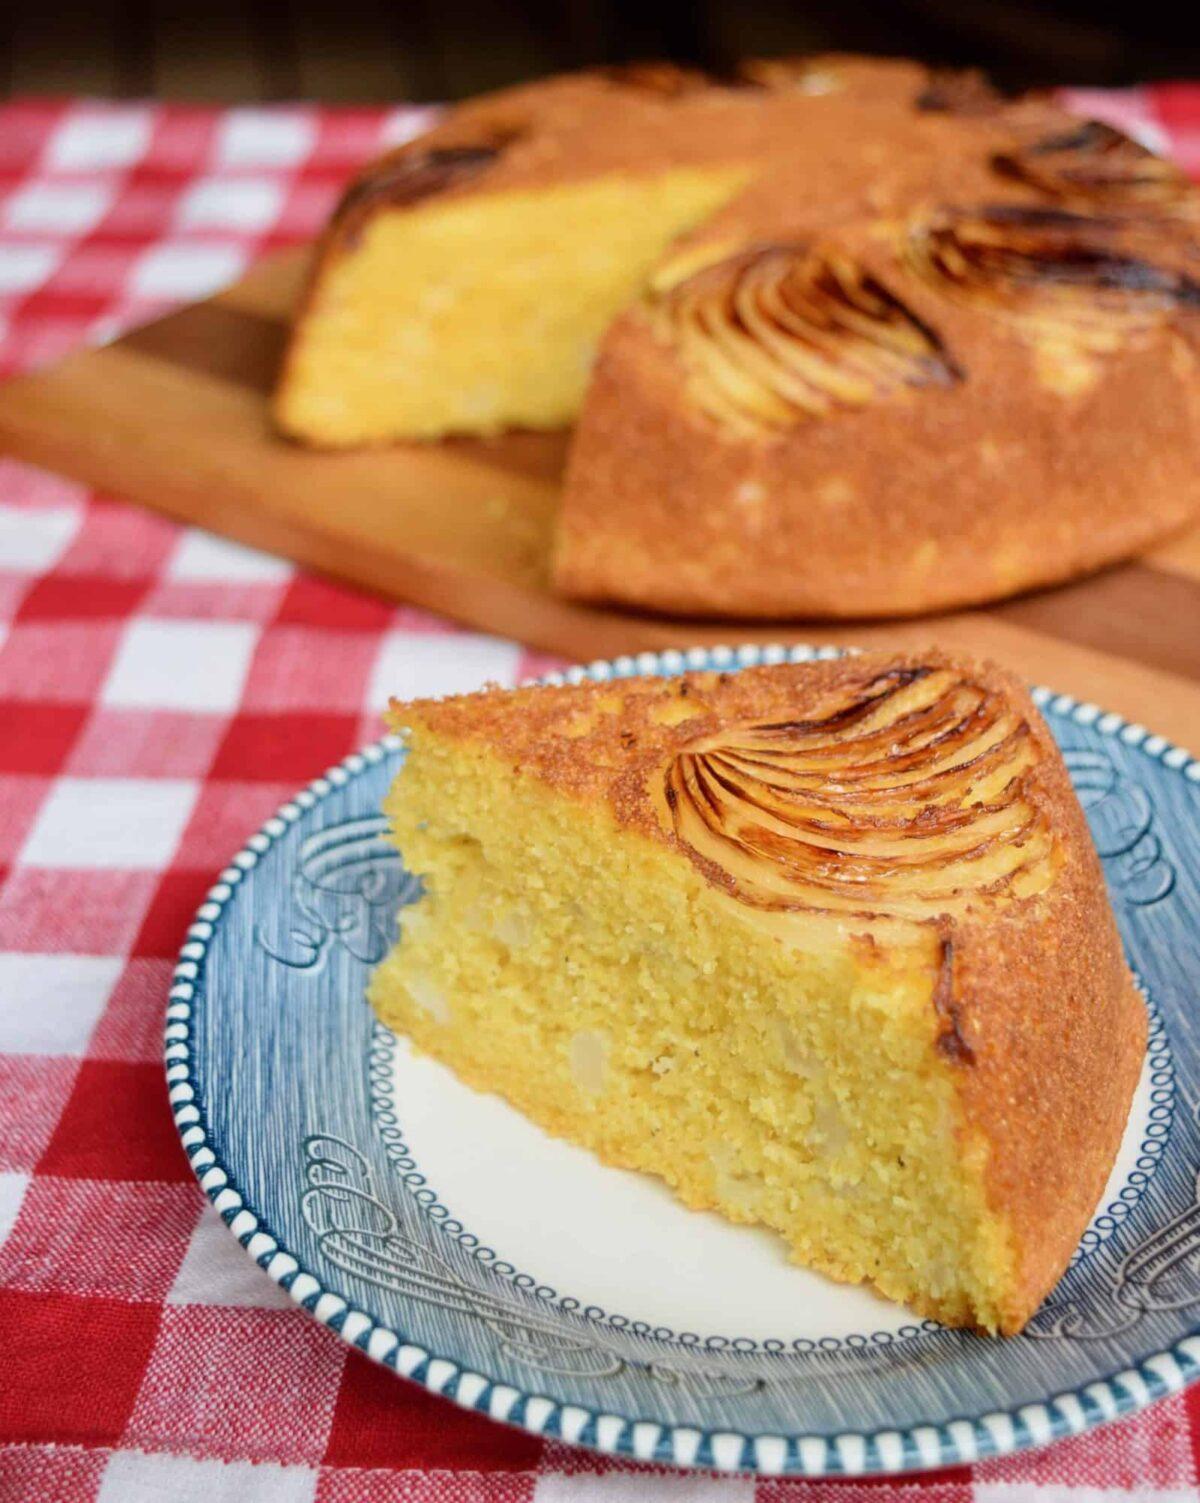 vidalia onion cornbread wedge on blue plate with cornbread in background on wooden cutting board